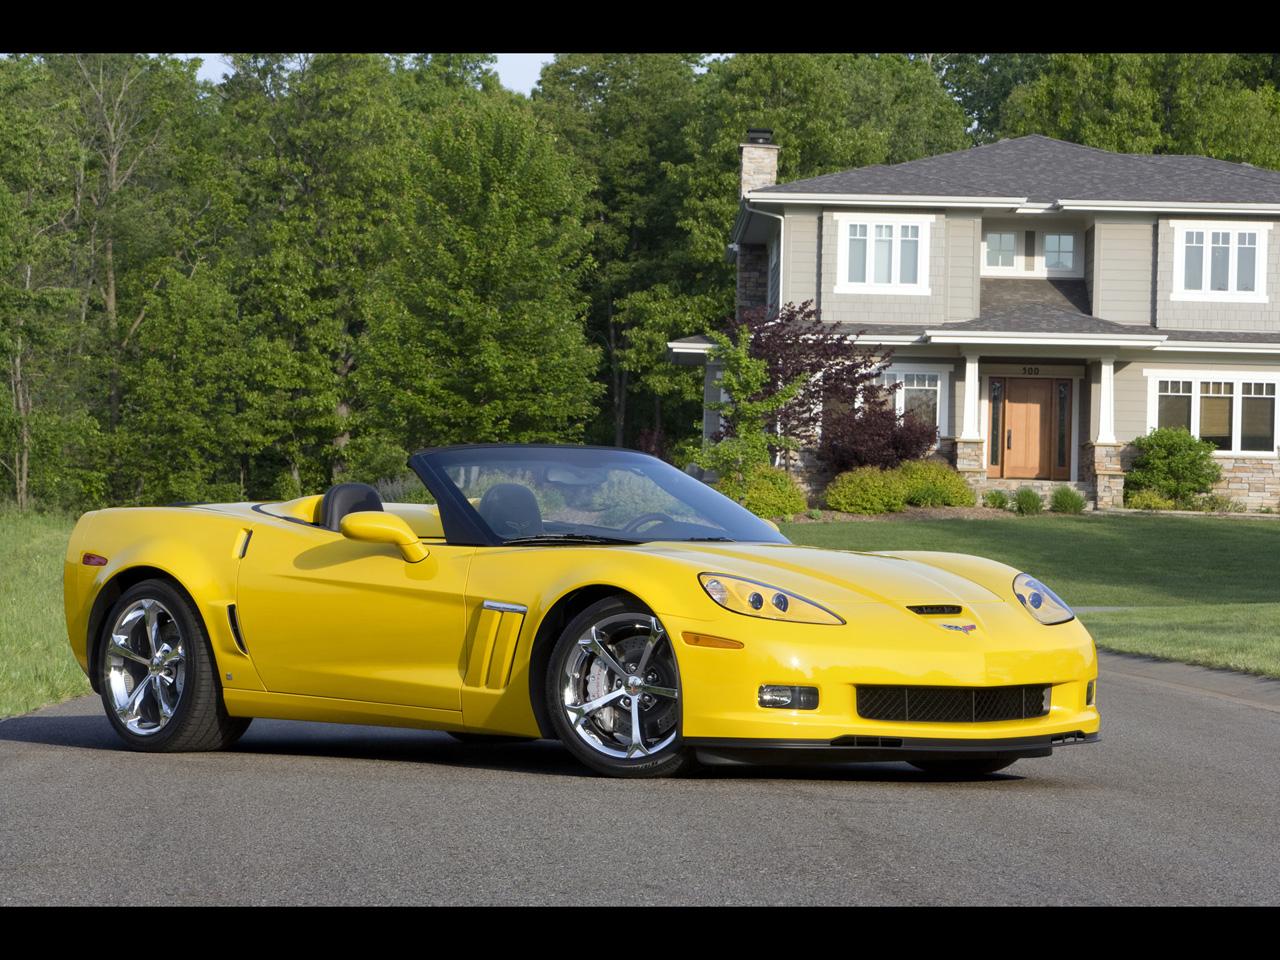 corvette wallpapers by cars. Black Bedroom Furniture Sets. Home Design Ideas